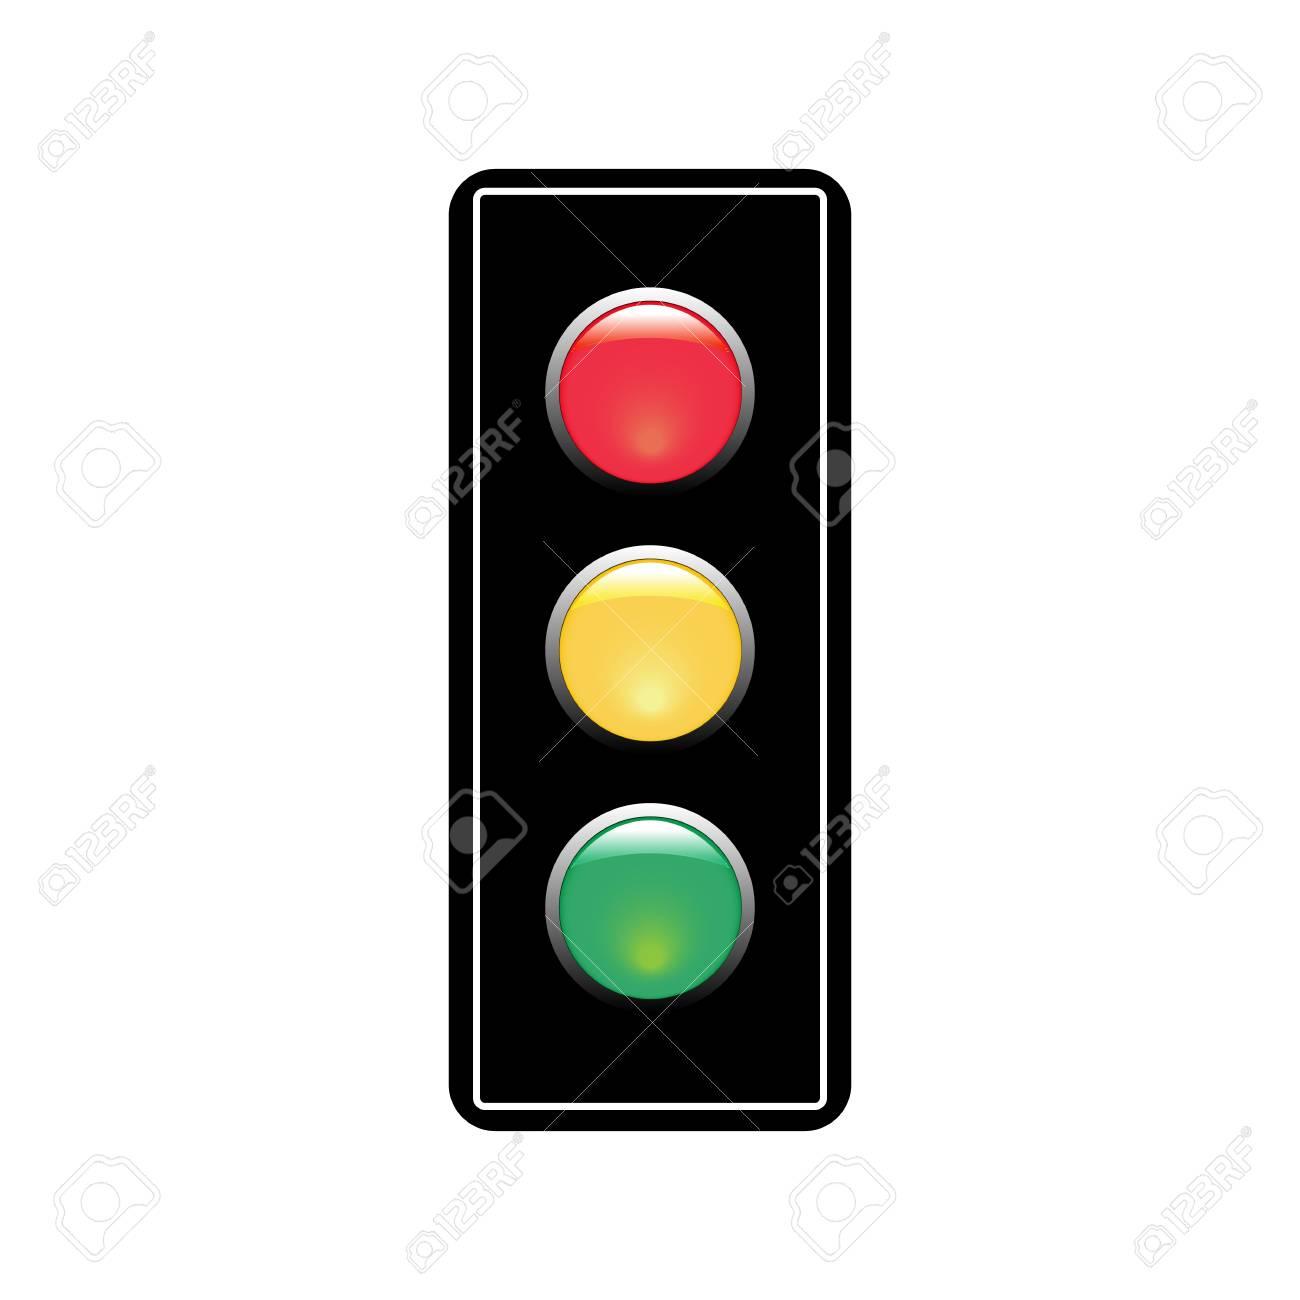 Stoplight sign. Icon traffic light on white background. Symbol regulate movement safety and warning. Electricity semaphore regulate transportation on crossroads urban road. Flat vector illustration. - 126765510